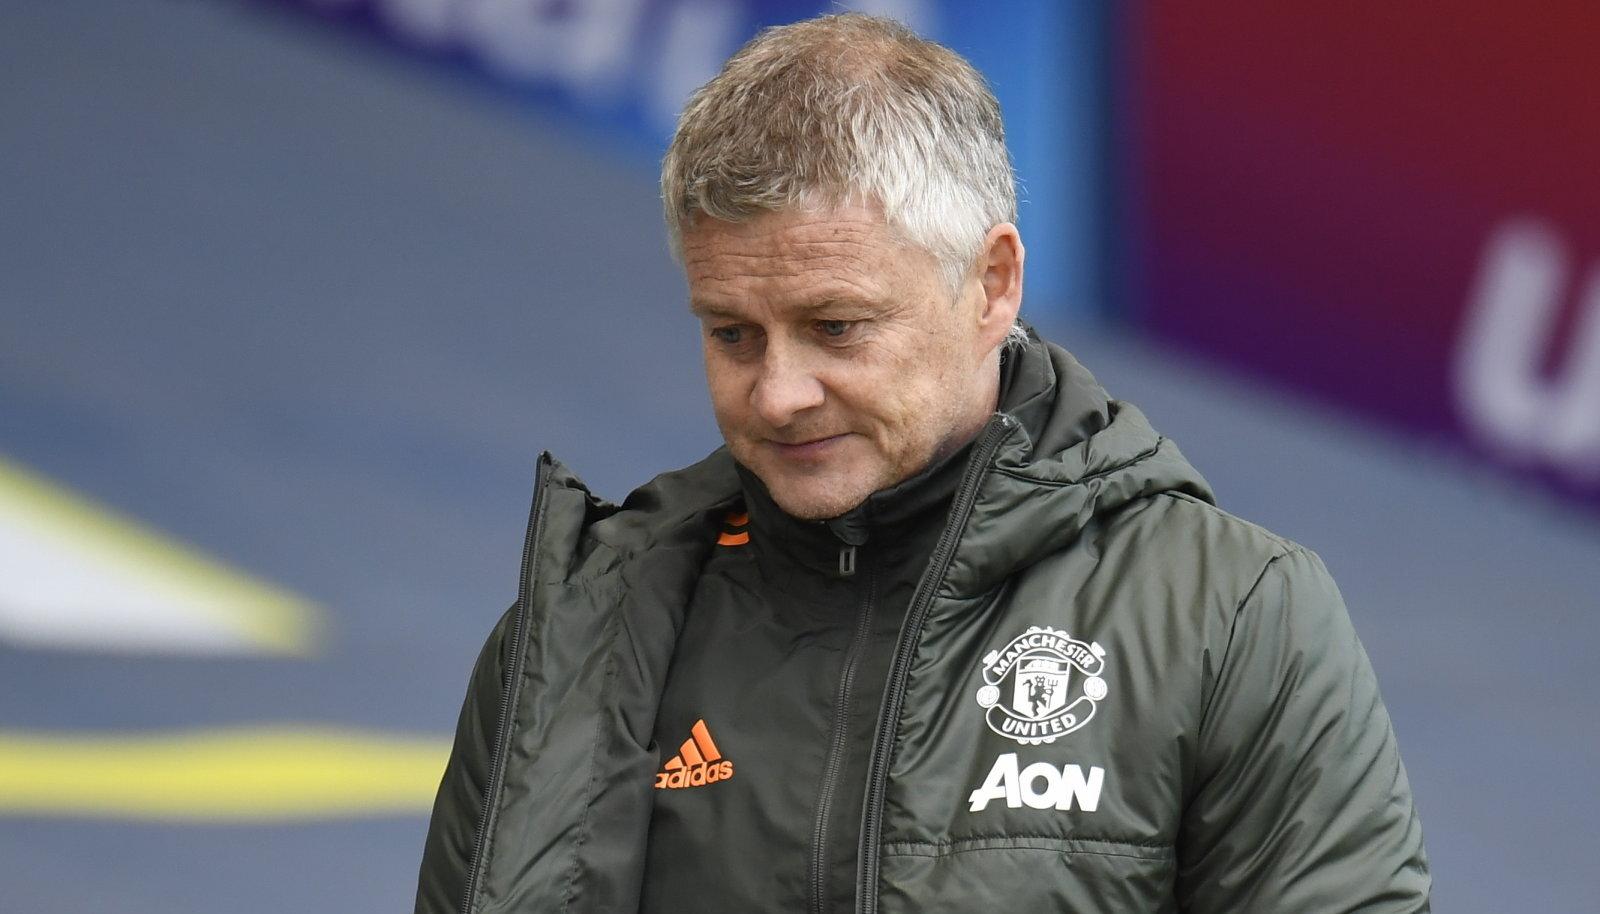 Manchester Unitedi peatreener Ole Gunnar Solskjaer